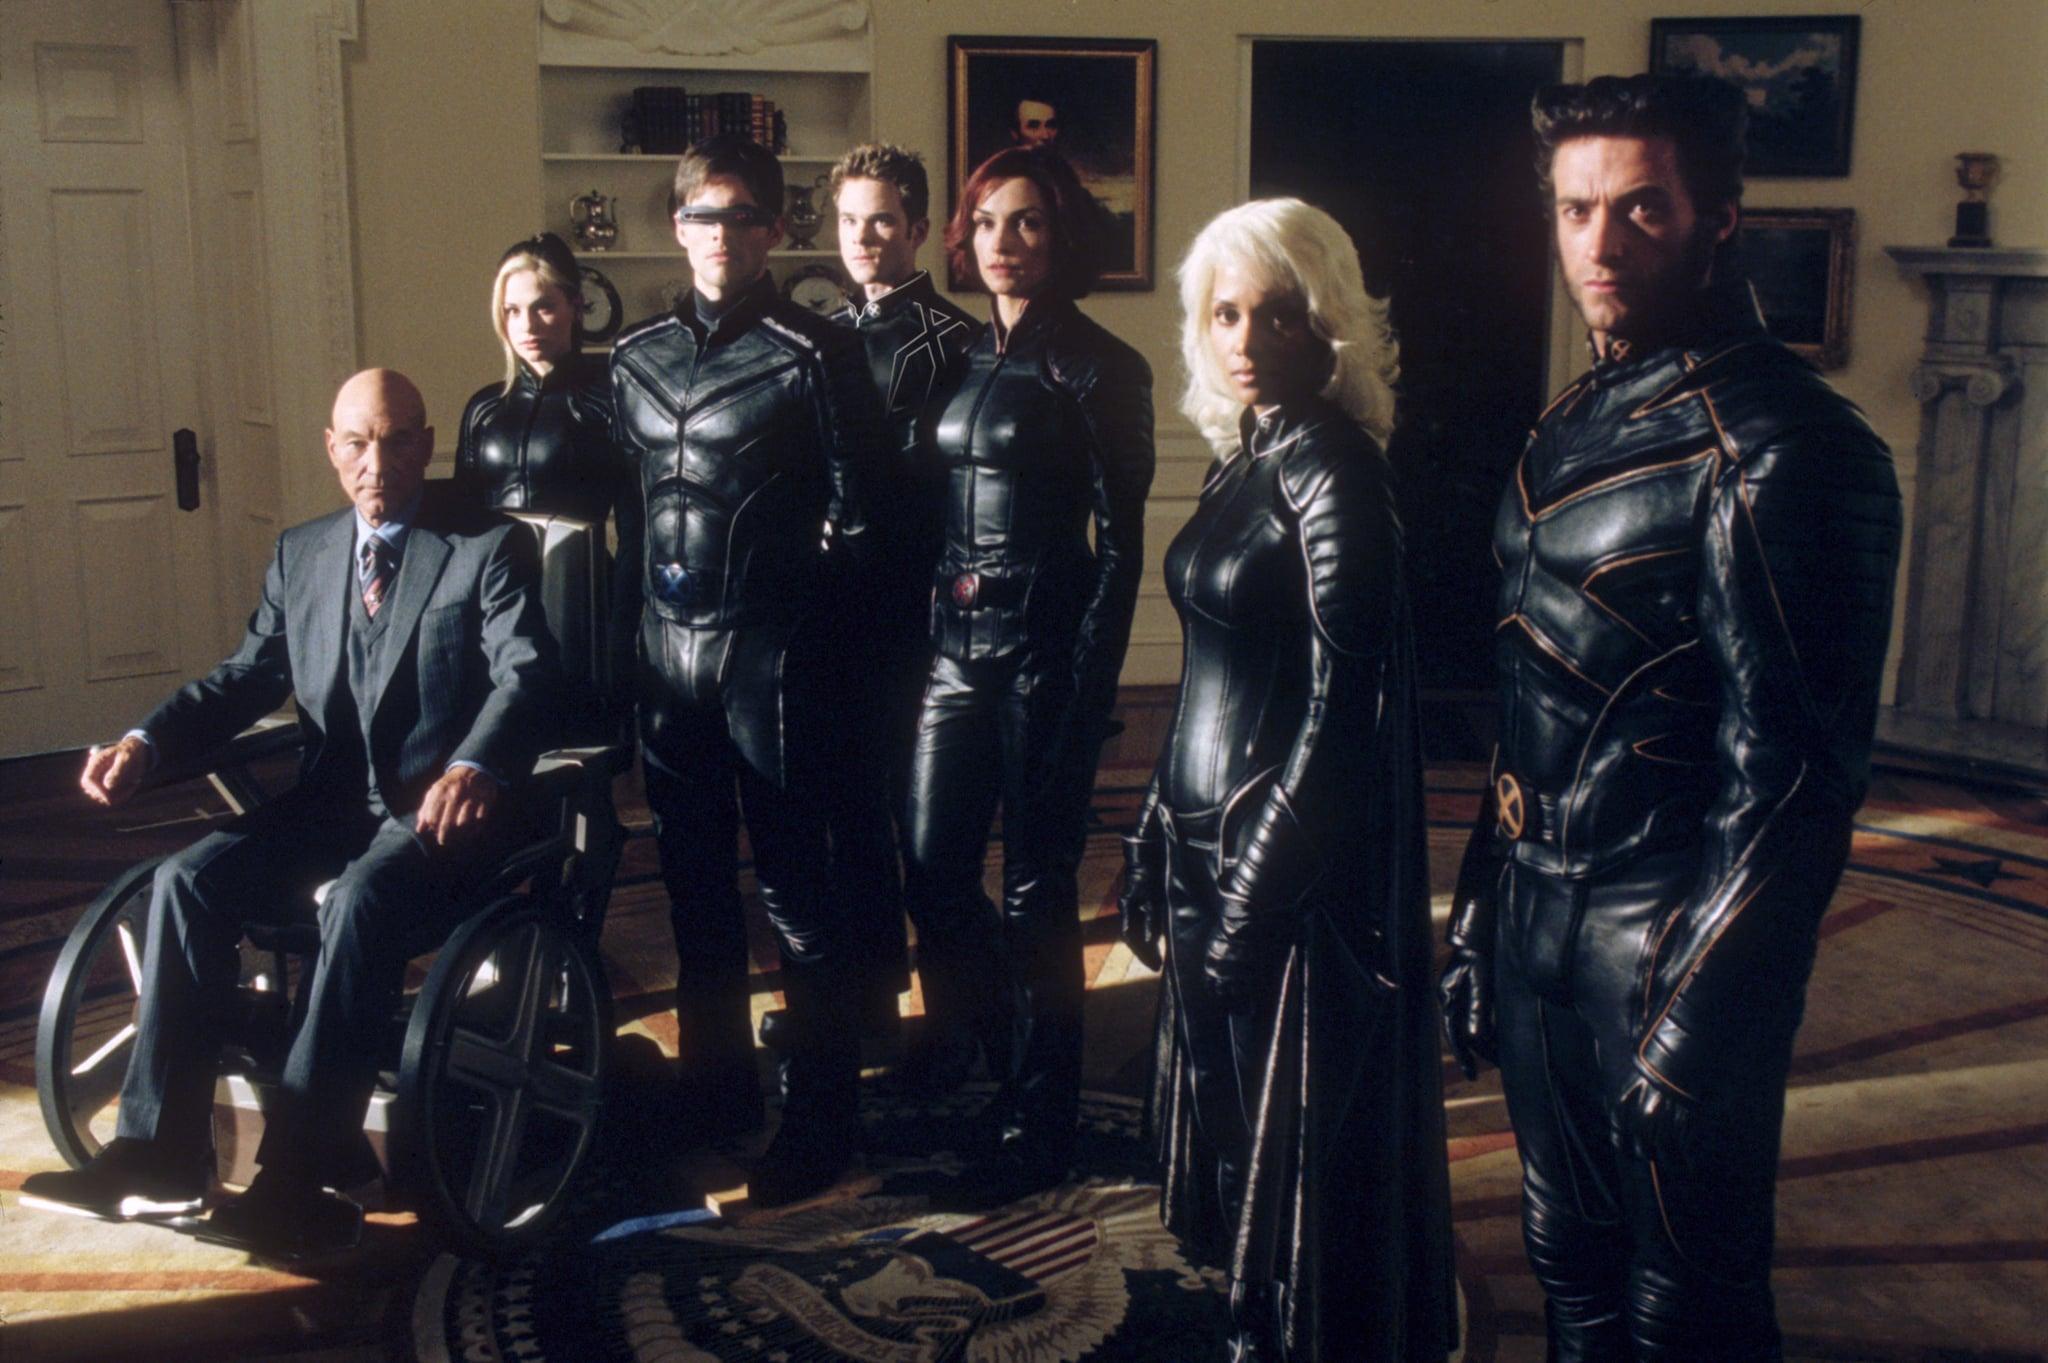 X-MEN 2, Patrick Stewart, Anna Paquin, James Marsden, Shawn Ashmore, Famke Janssen, Halle Berry, Hugh Jackman, 2003, TM & Copyright (c) 20th Century Fox Film Corp. All rights reserved.